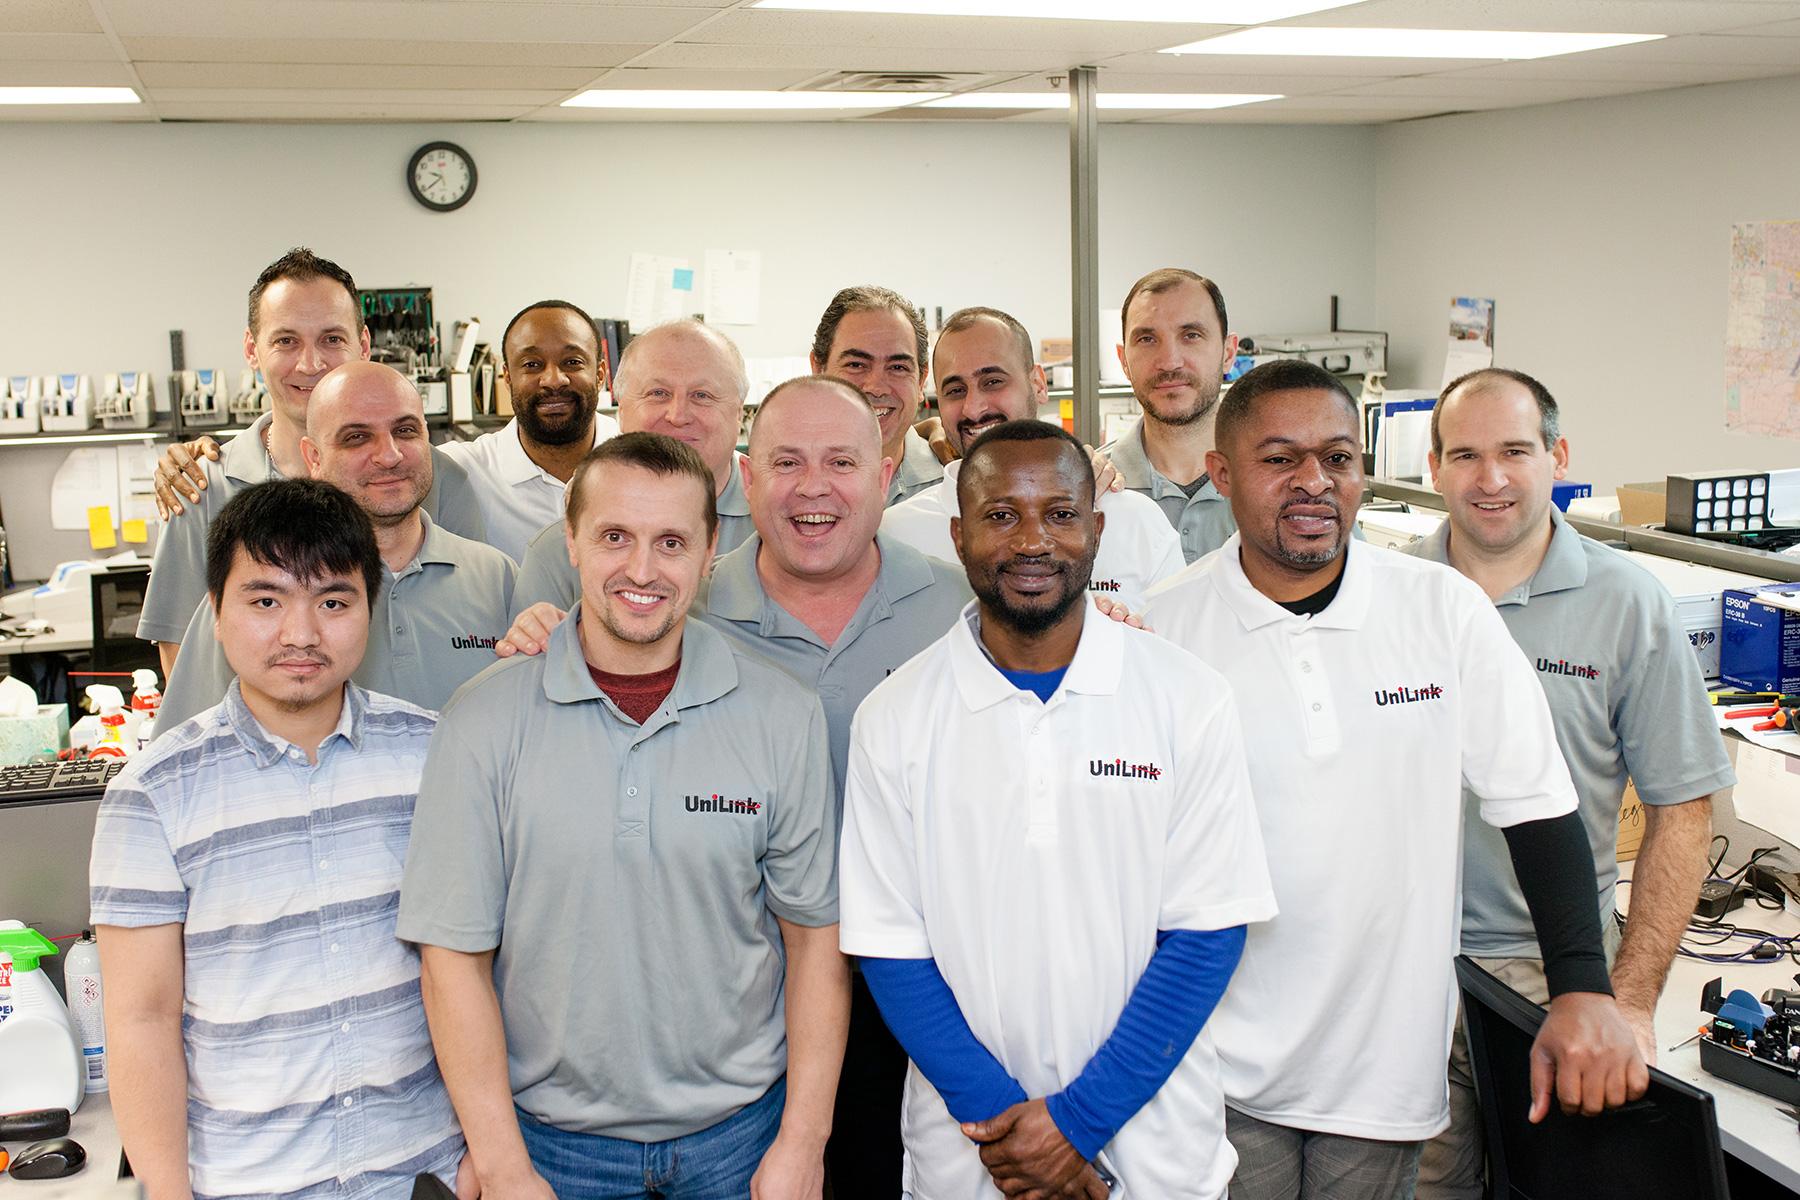 UniLink Technicians